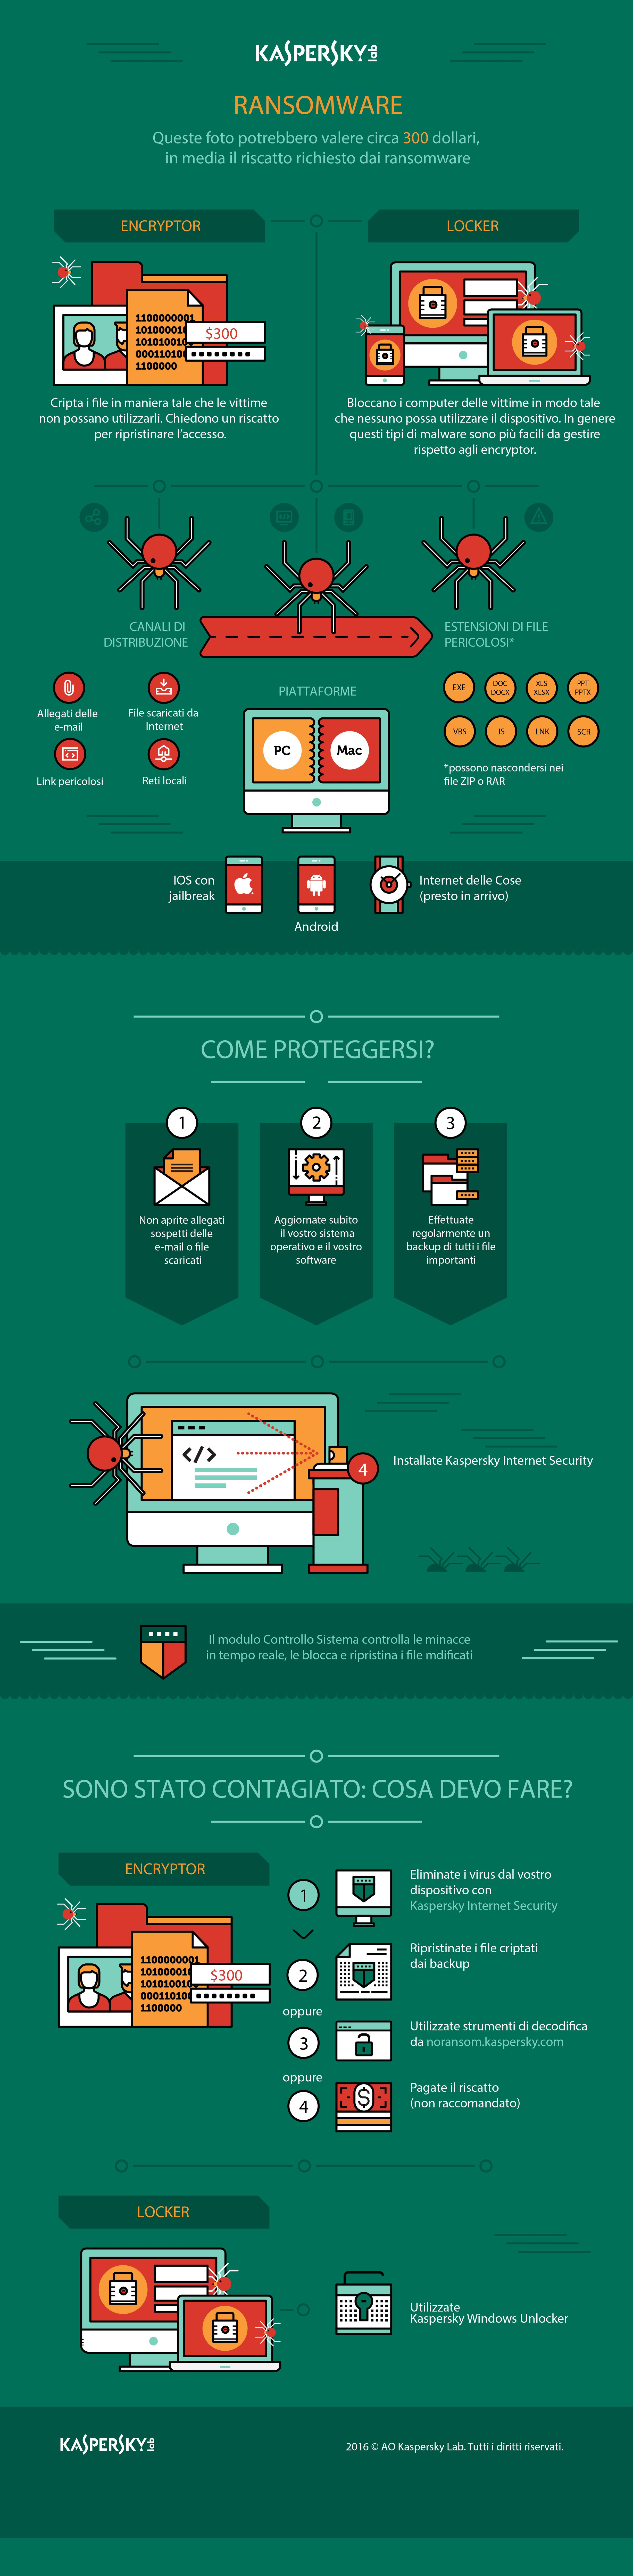 L'infografica ransomware